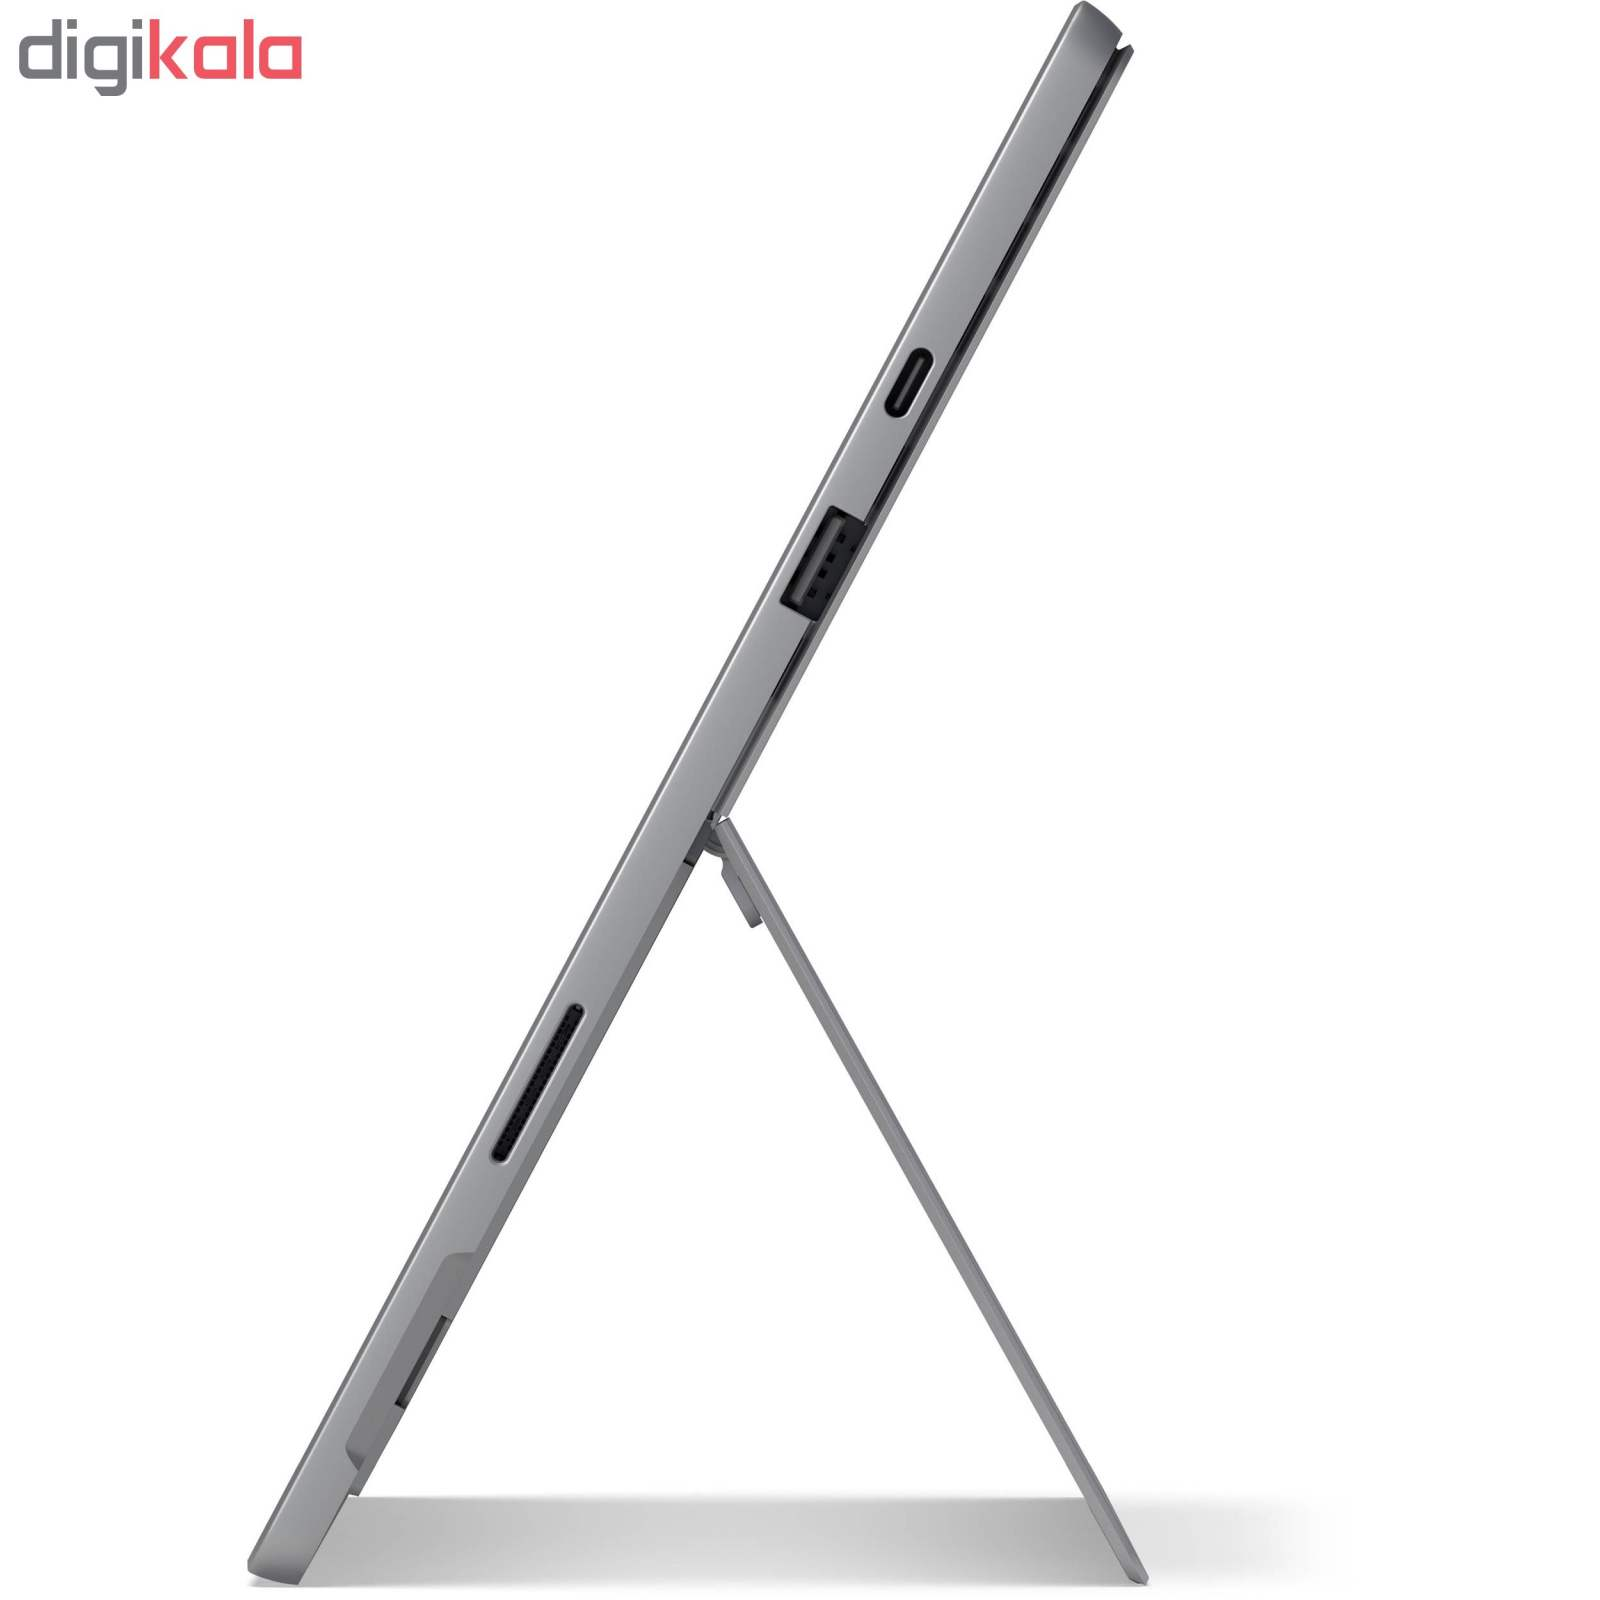 تبلت مایکروسافت مدل Surface Pro 7 - C به همراه کیبورد Black Type Cover main 1 8